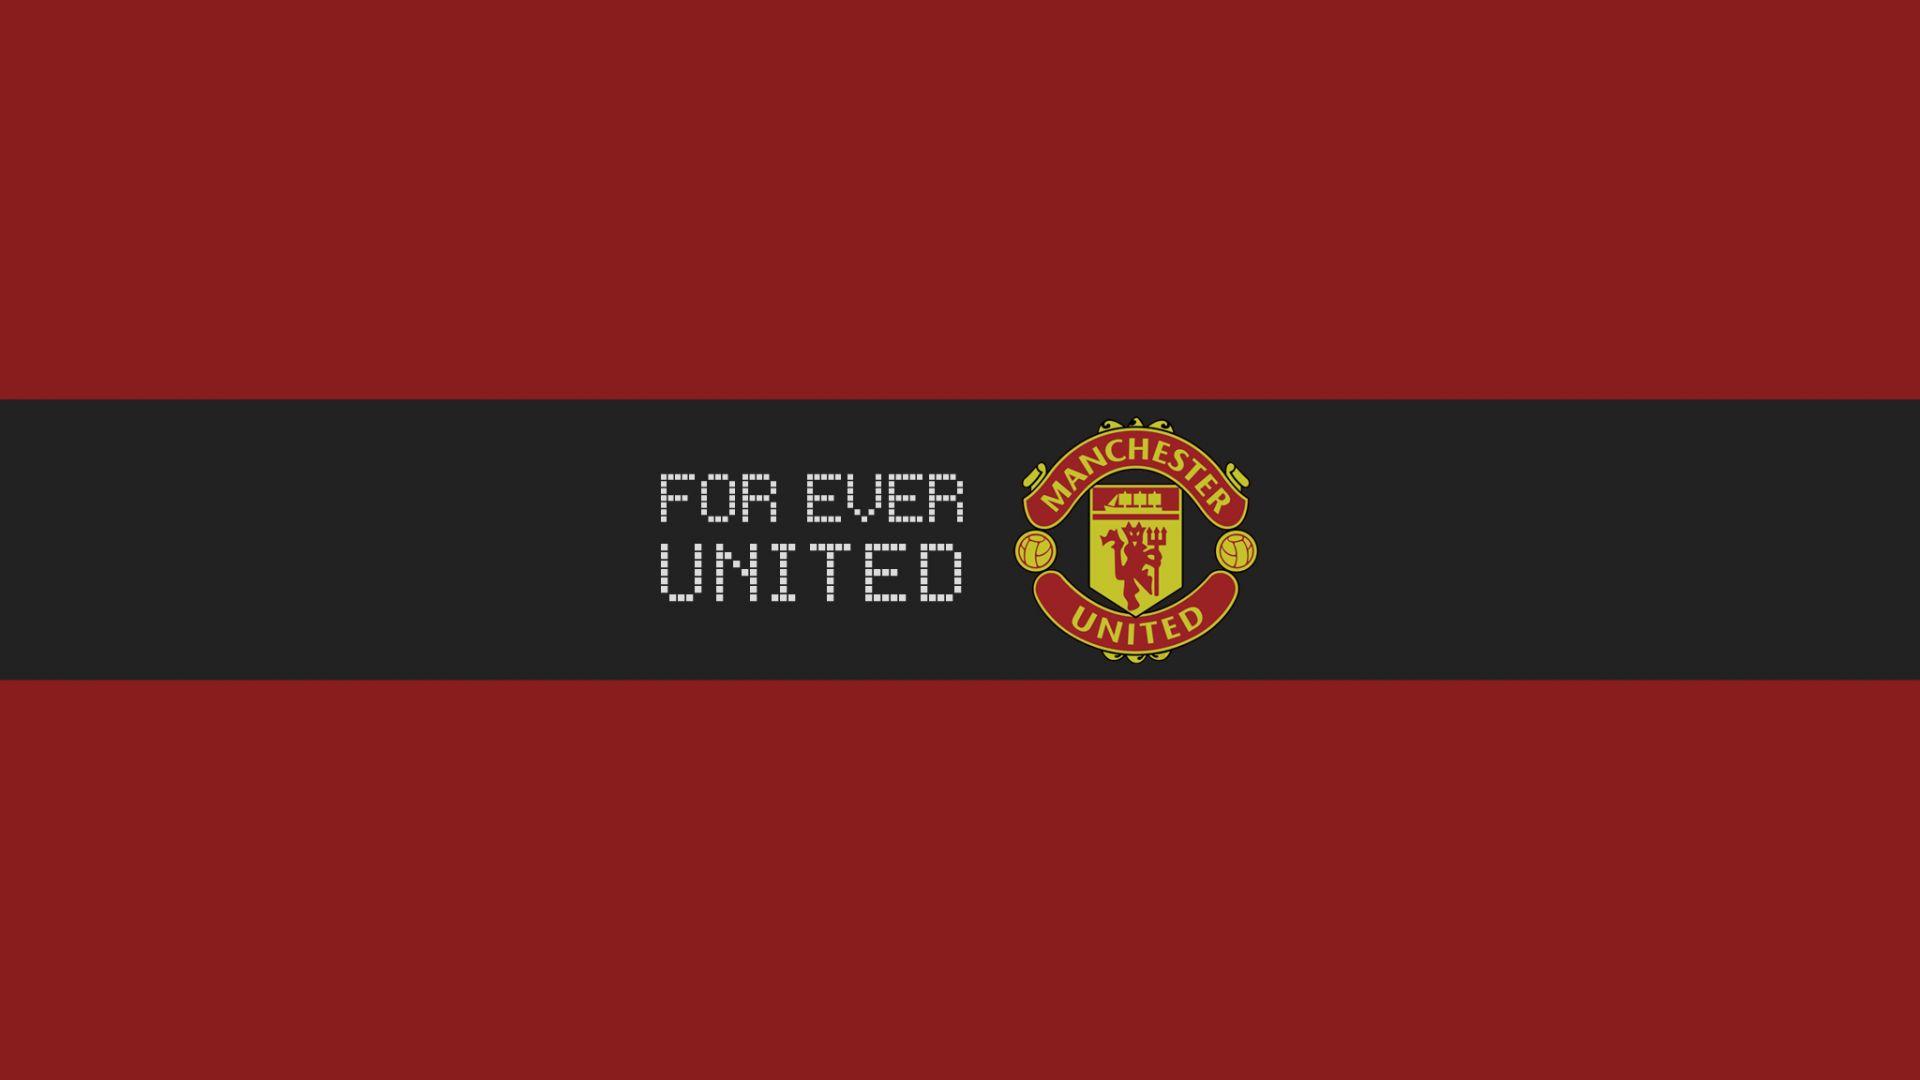 Wallpaper Manchester United football team logo